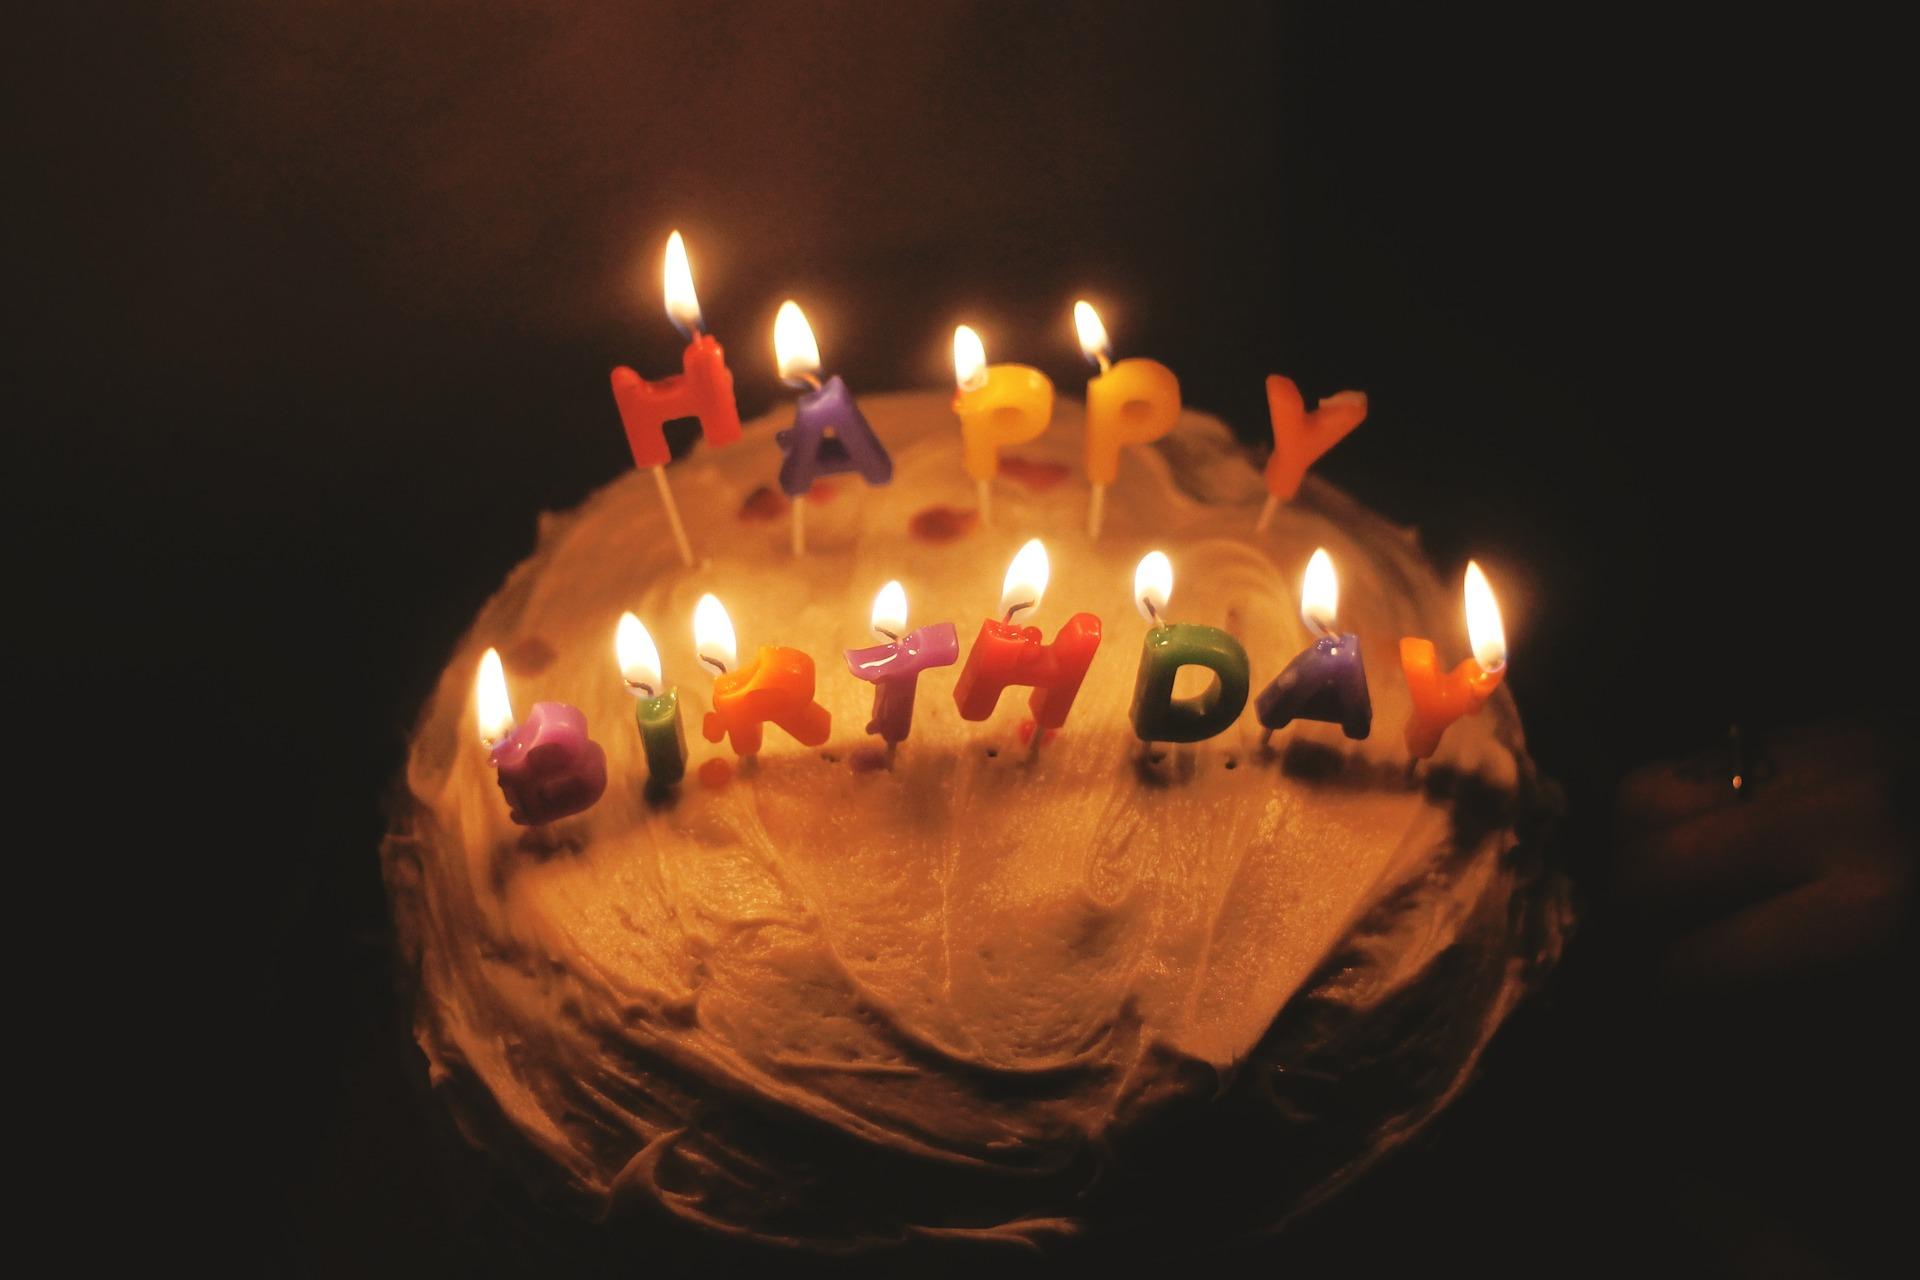 La Chanson Happy Birthday To You Souffle Sa Premiere Bougie De Liberation Jurizone